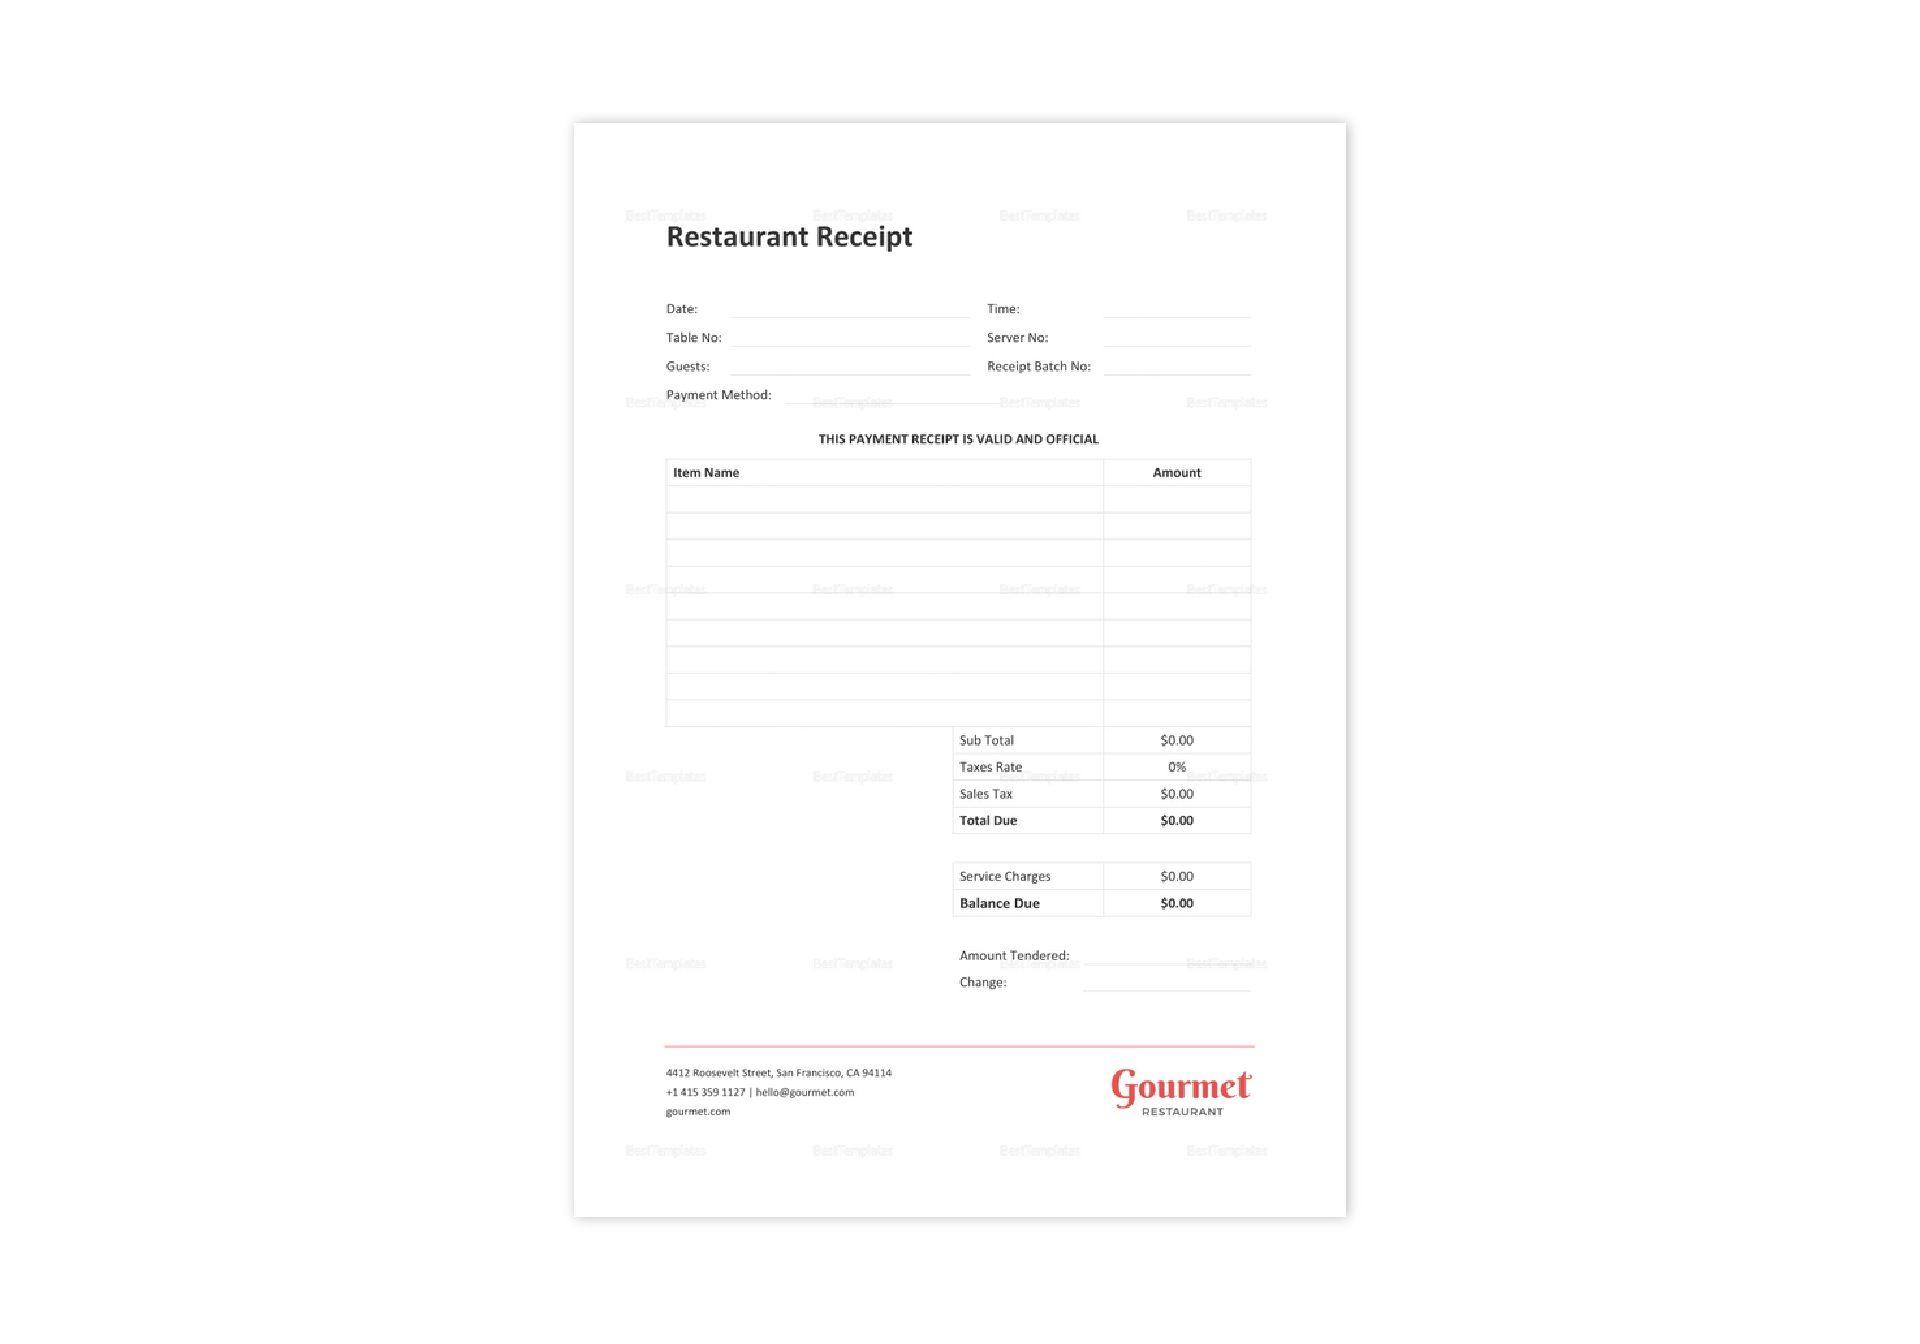 Sample Restaurant Receipt Template In Word Excel Apple